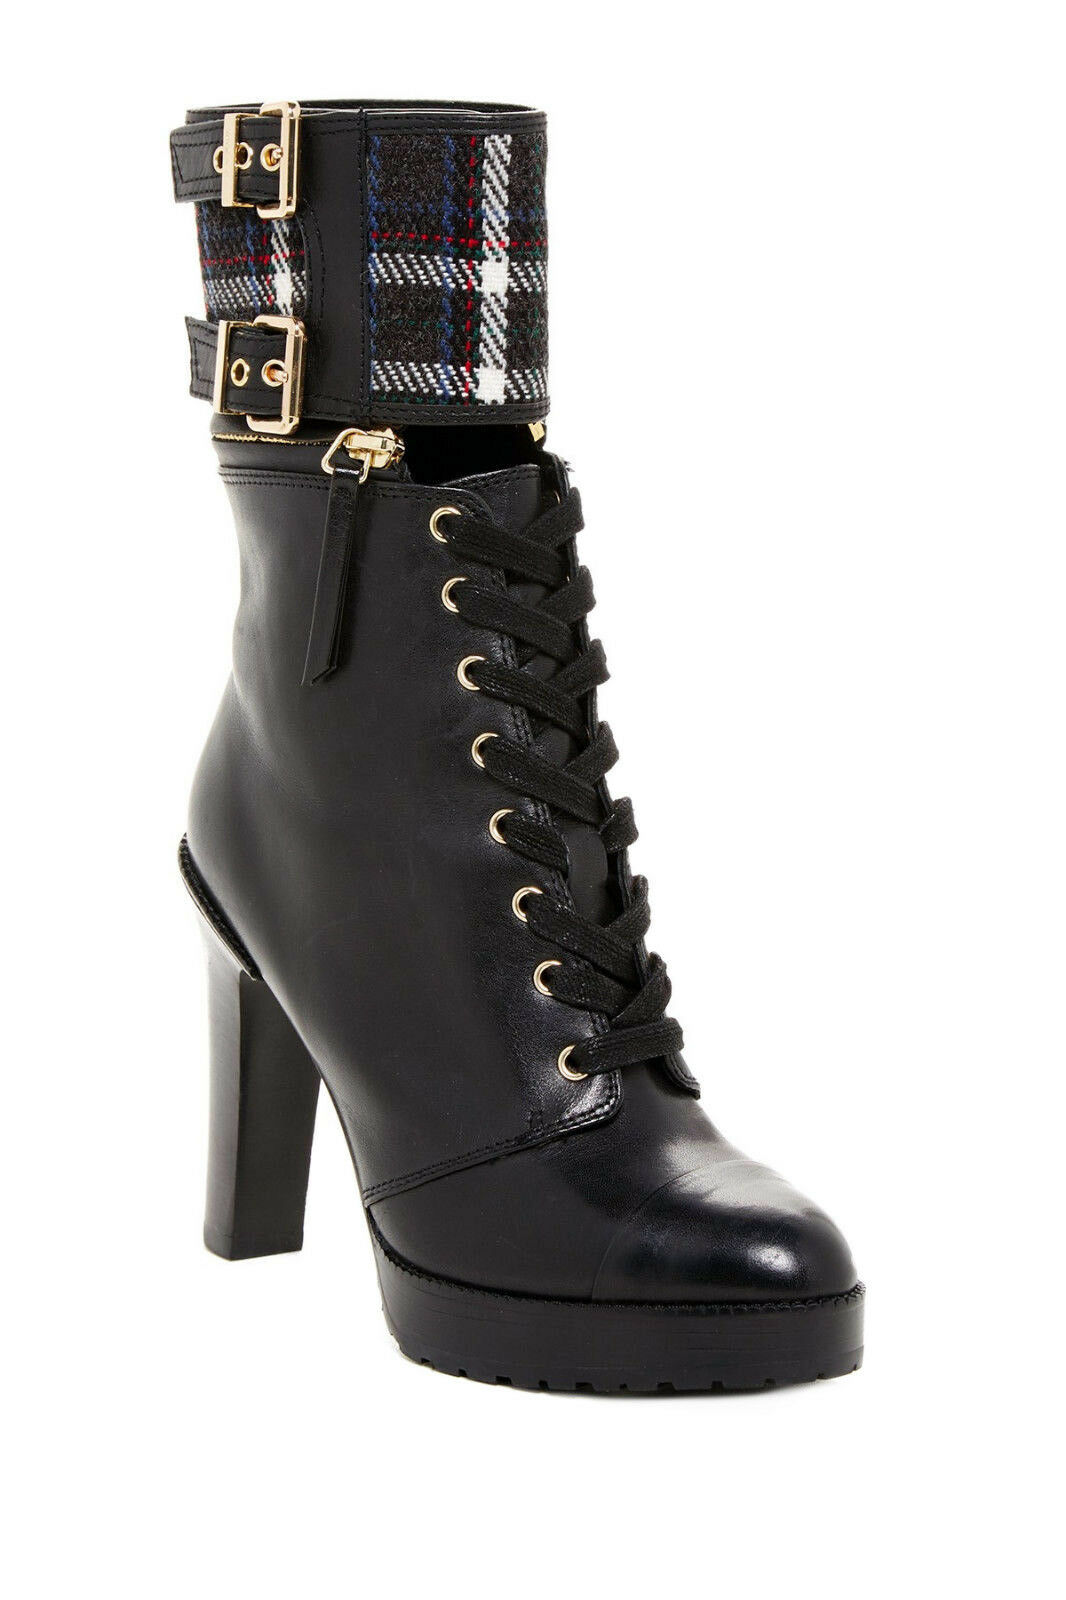 Diesel MOTORSAFARI KAPE Womens Fashion Heels Platform Black Leather  Bootie